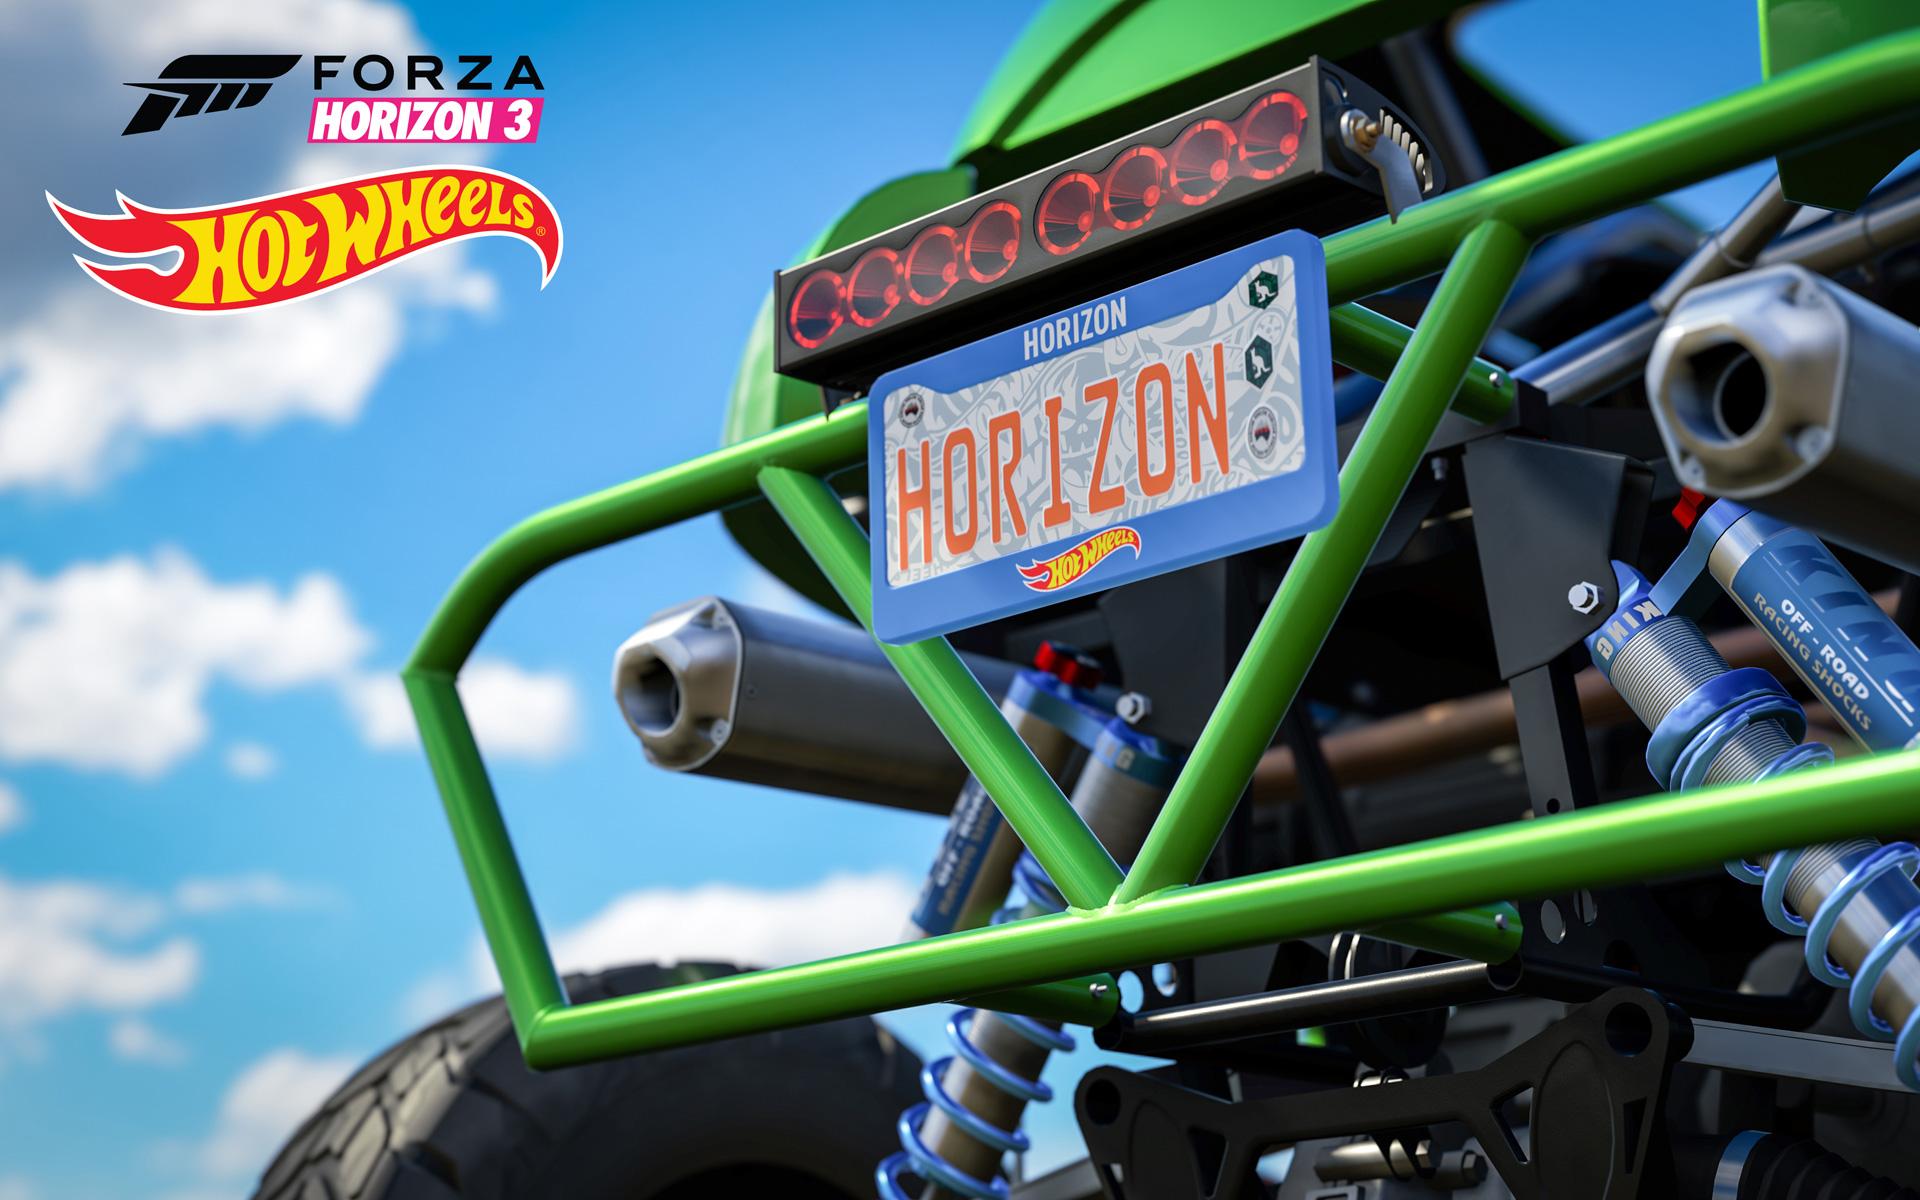 Forza Horizon 3 Wallpaper in 1920x1200